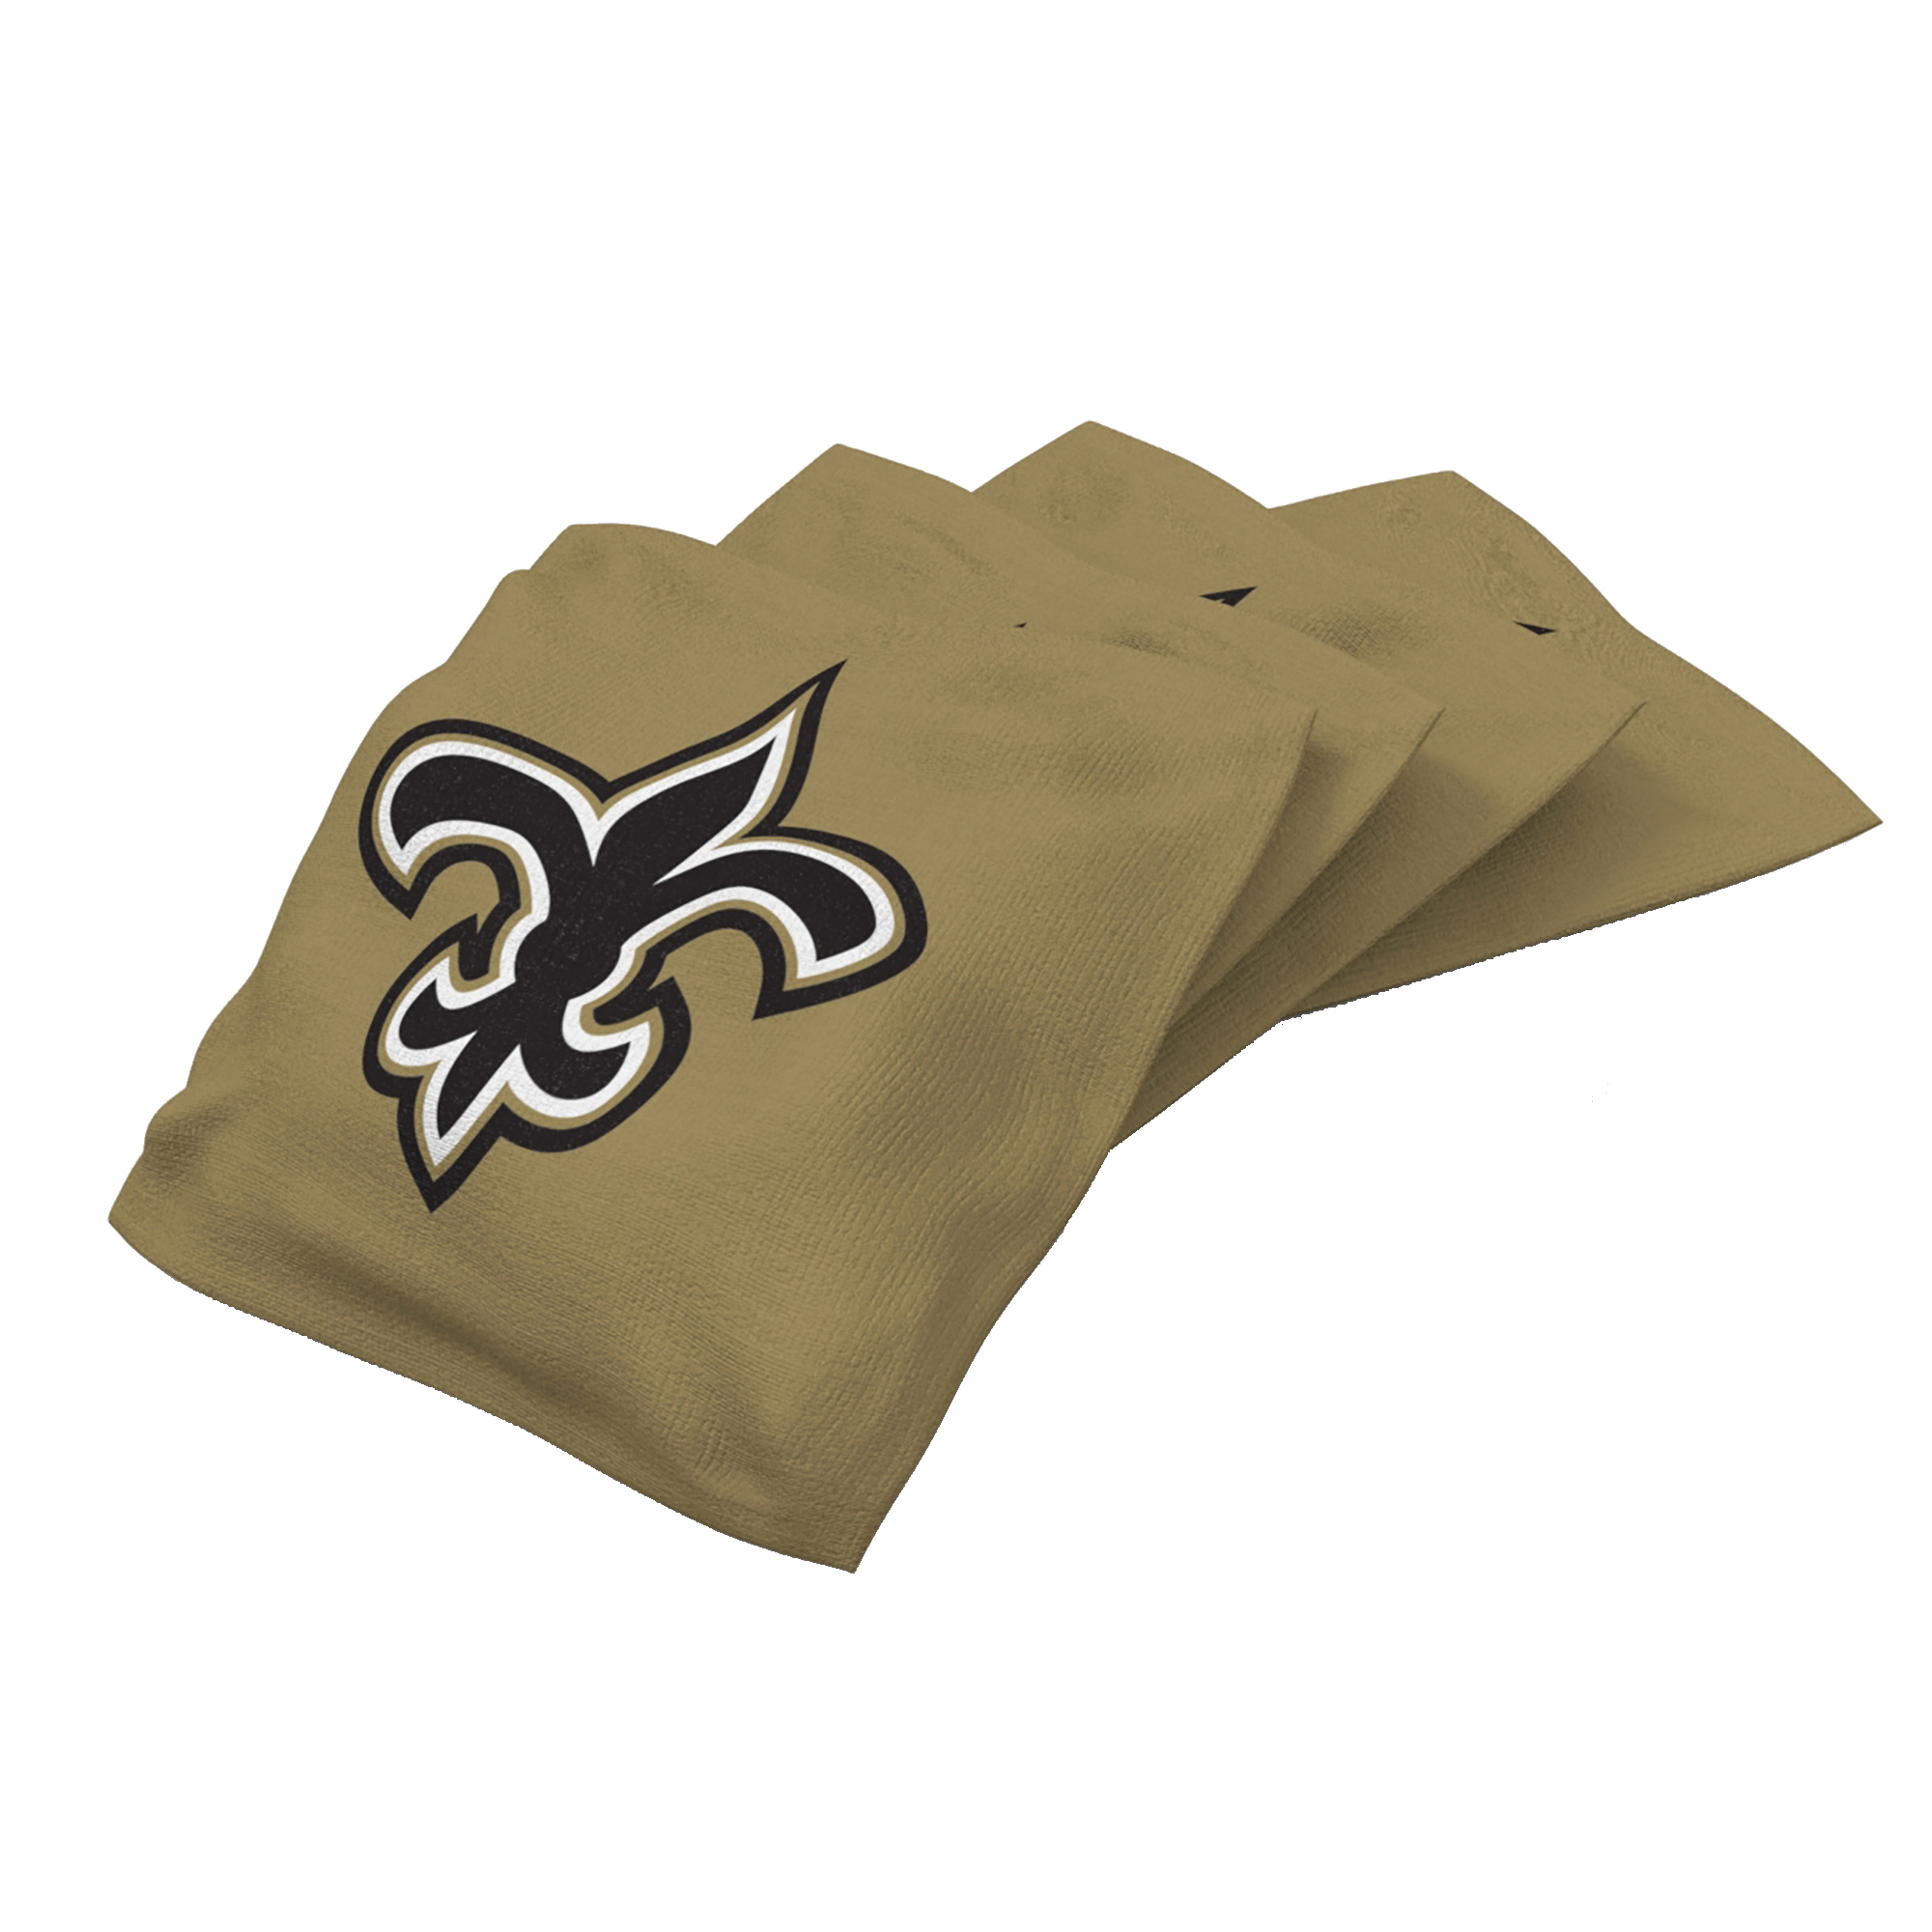 XL Bean Bag 4pk Tampa Bay Rays Teal